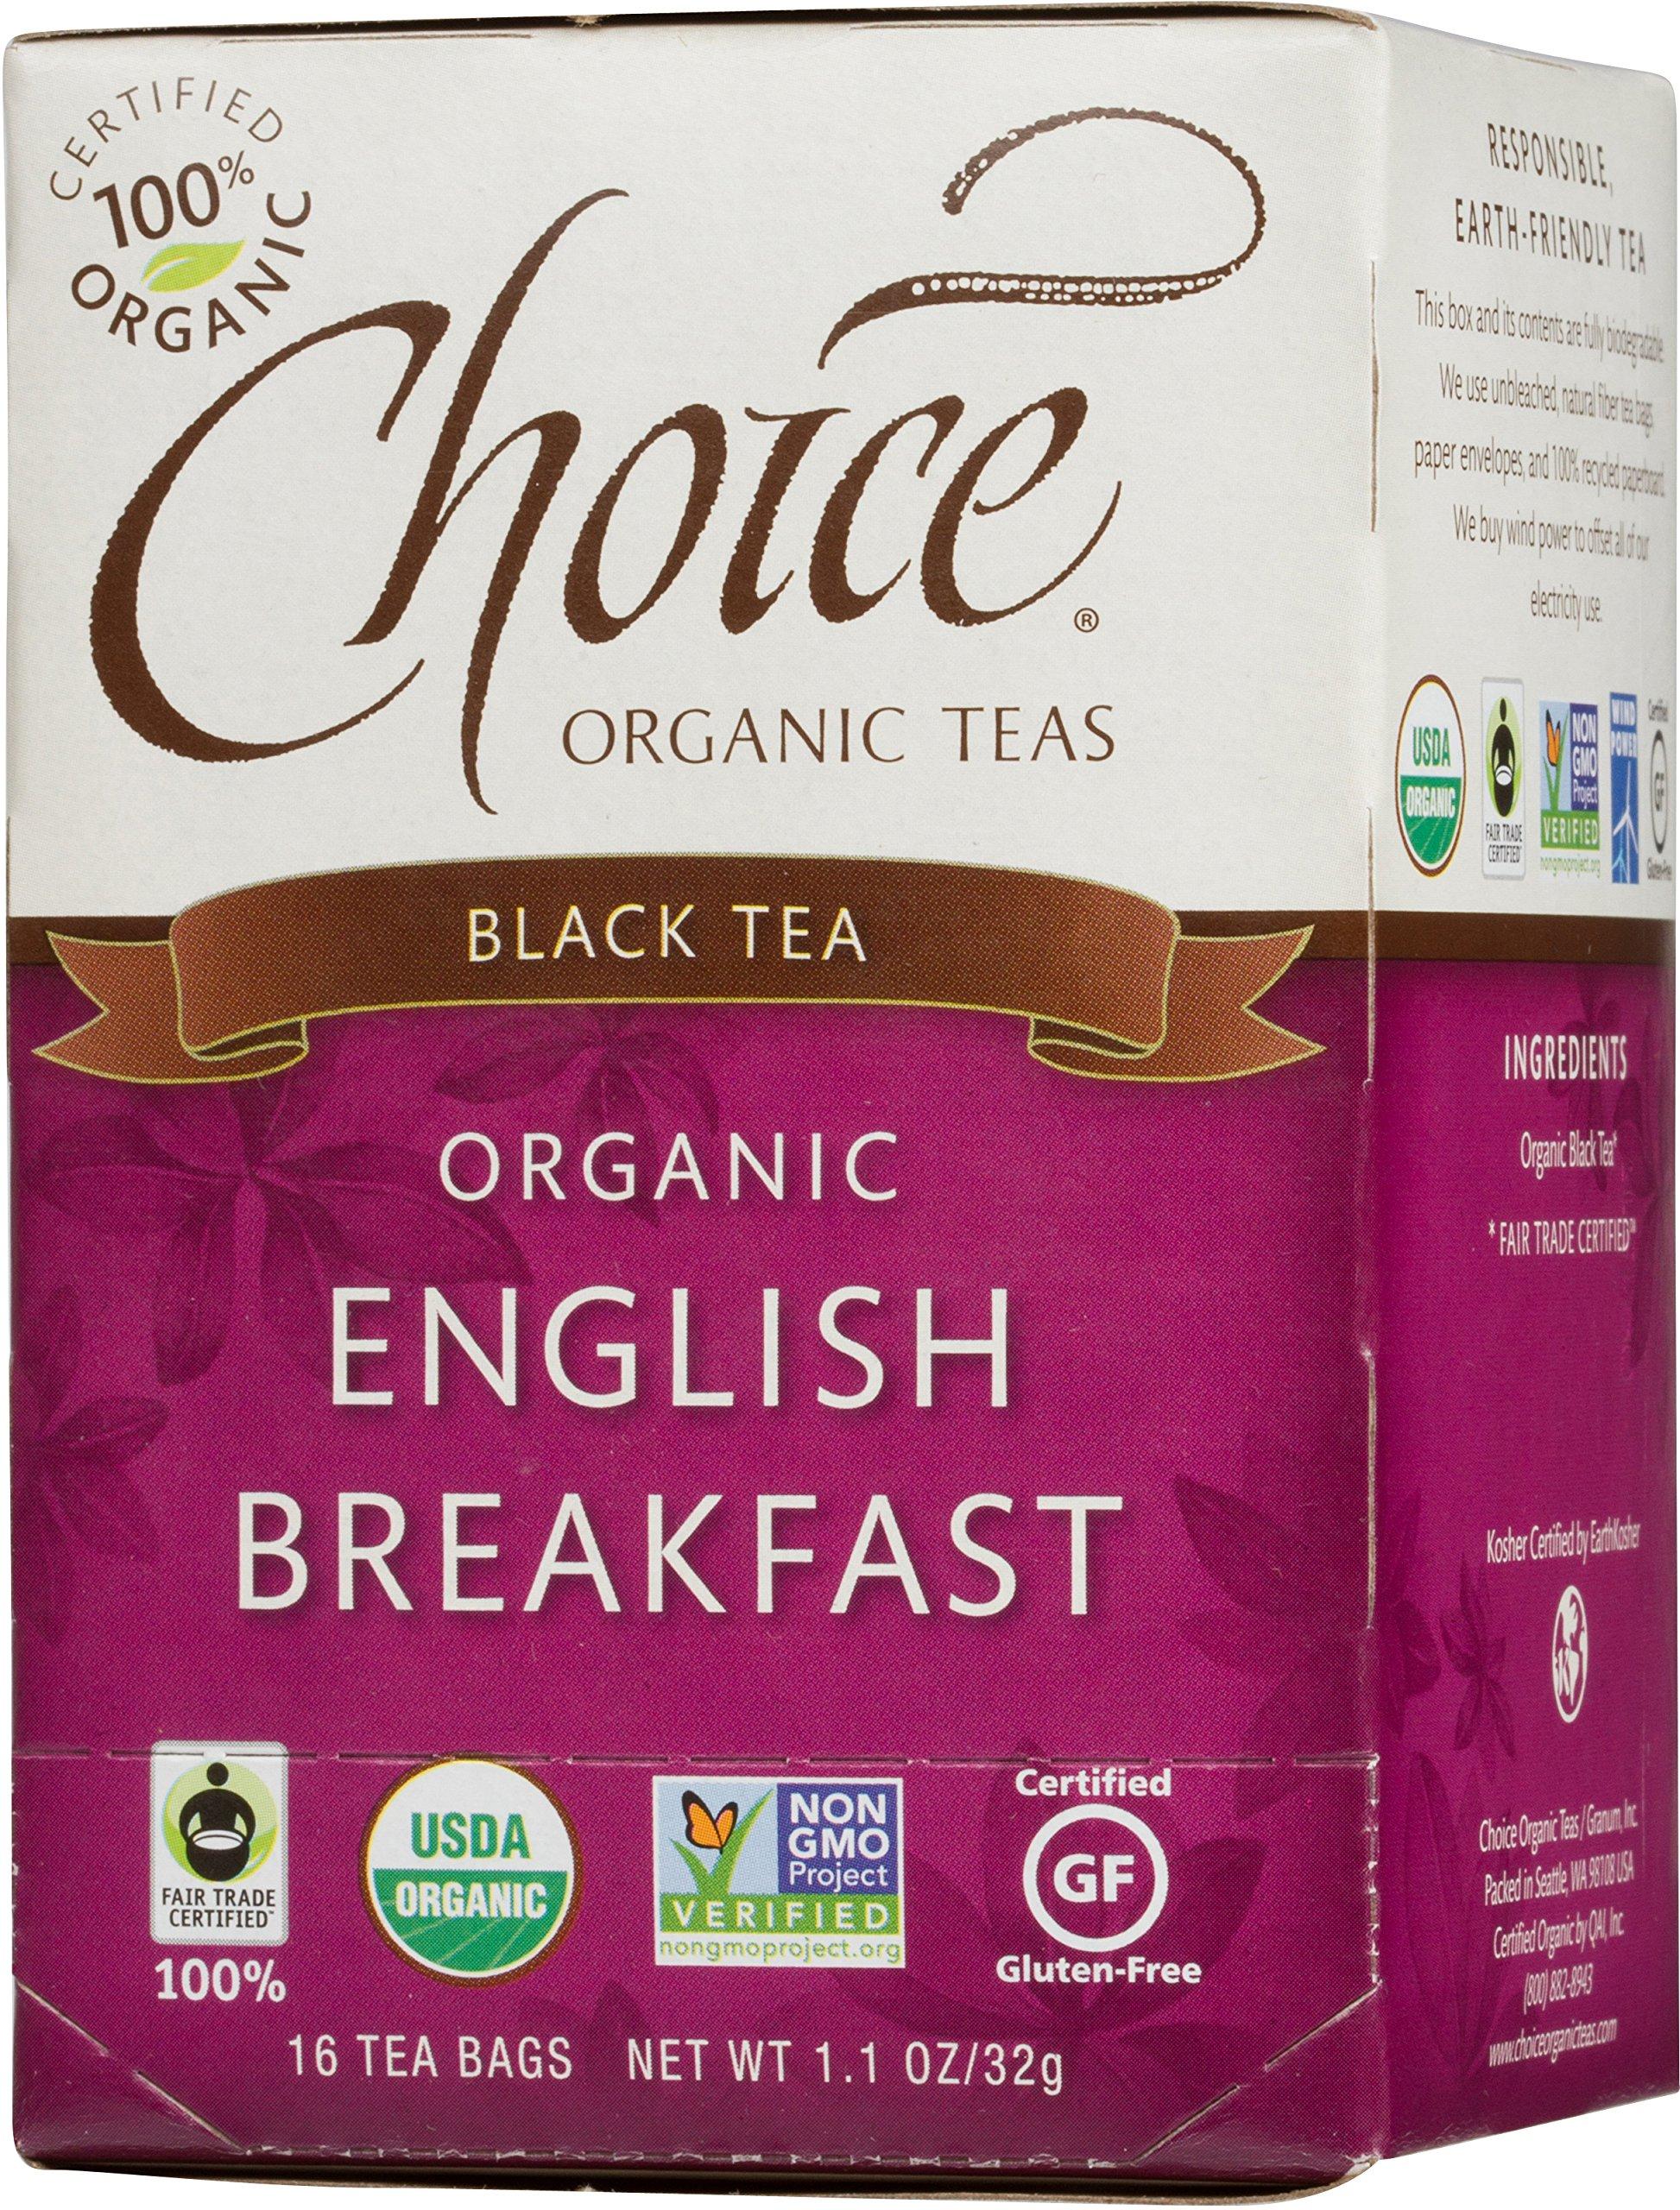 Choice Organic English Breakfast Black Tea, 16 Count Box